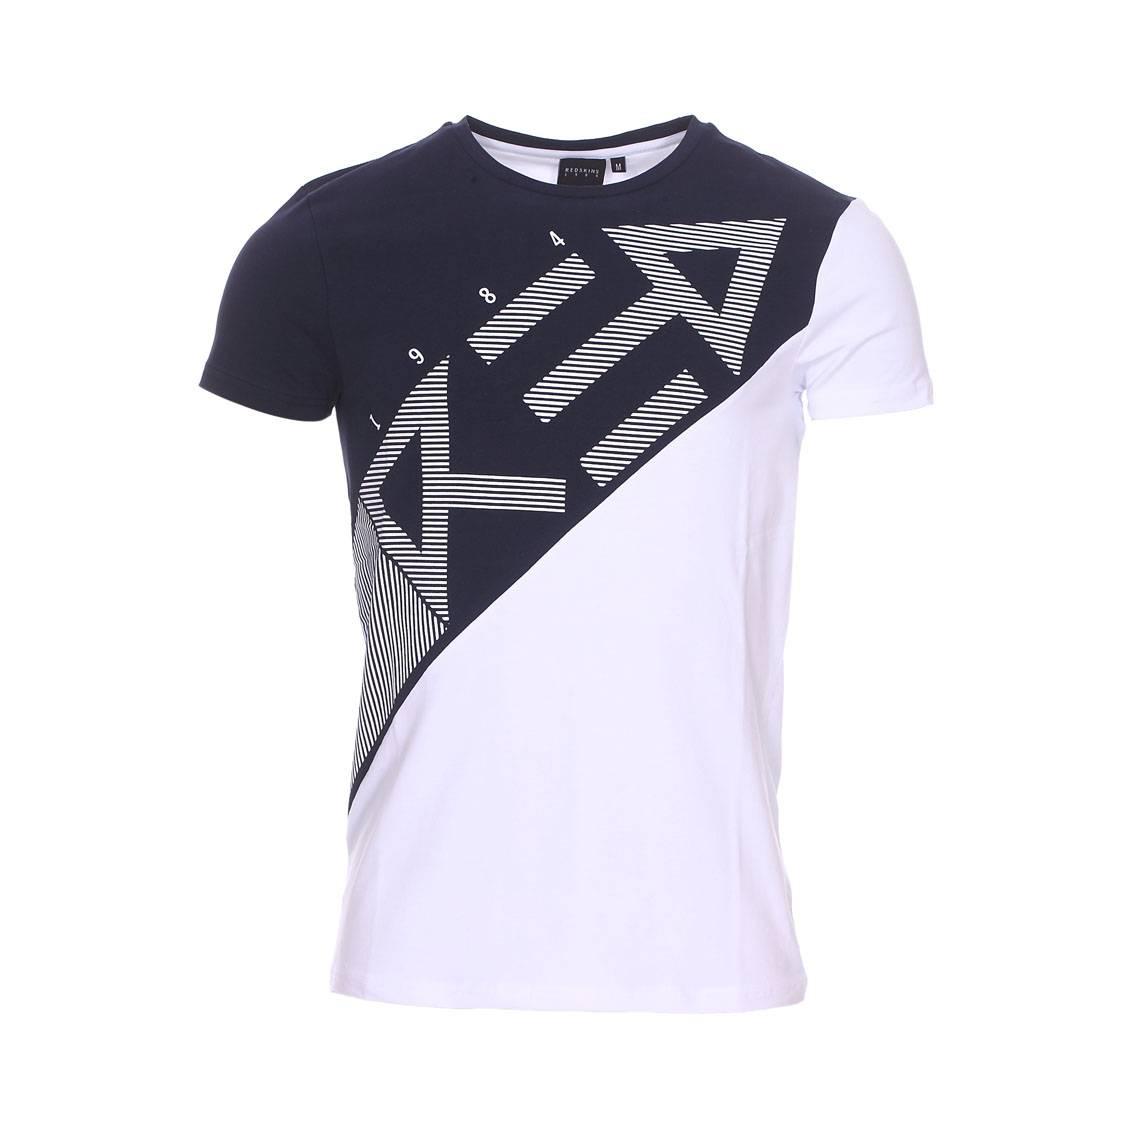 Tee-shirt col rond  en coton stretch blanc et bleu marine